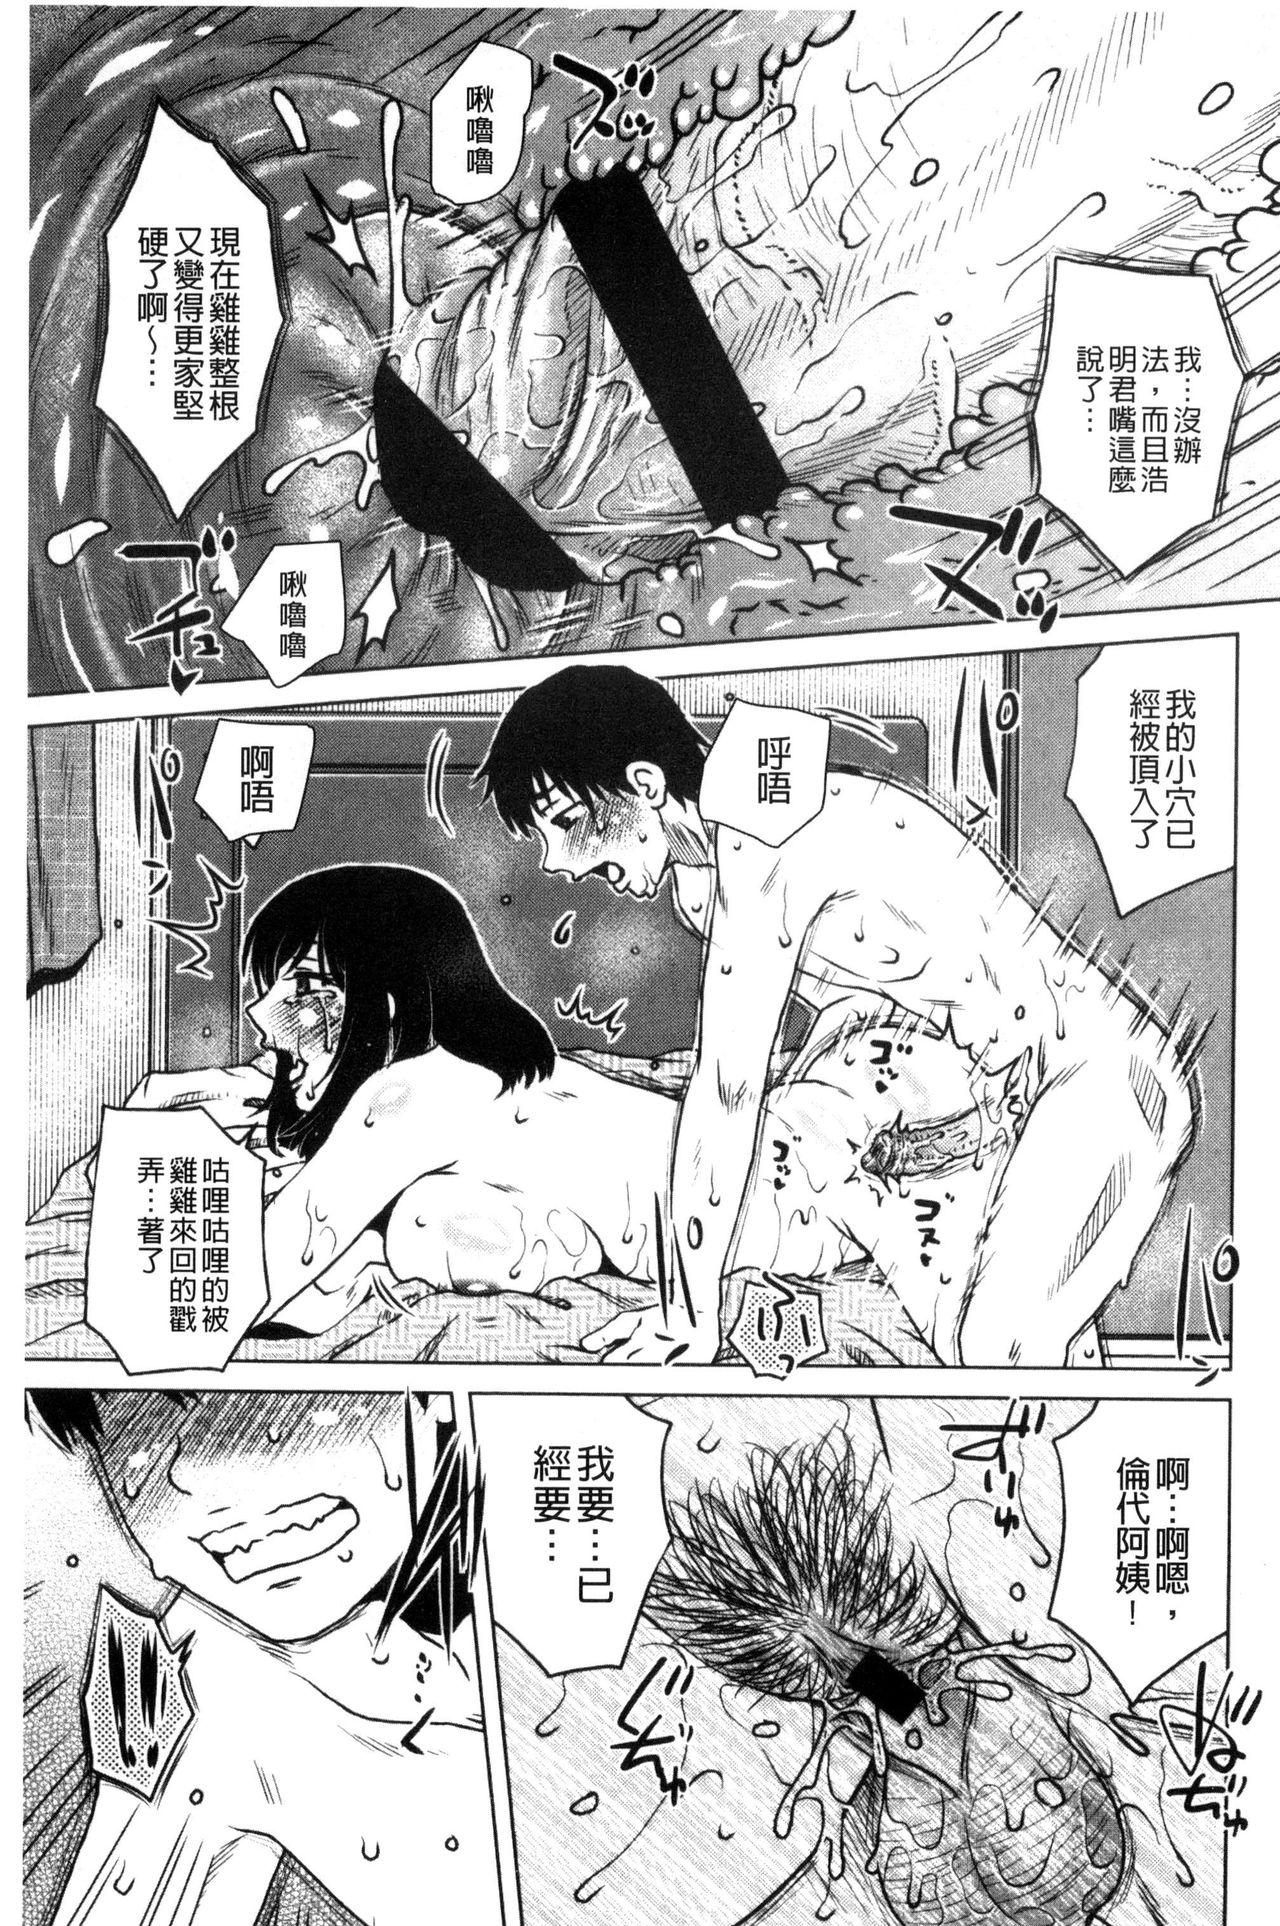 [Kurumiya Mashimin] Uchi no Shachou no Hamedere Inkatsu - Our President is HAME-DERE in Licentious sex life. [Chinese] 119